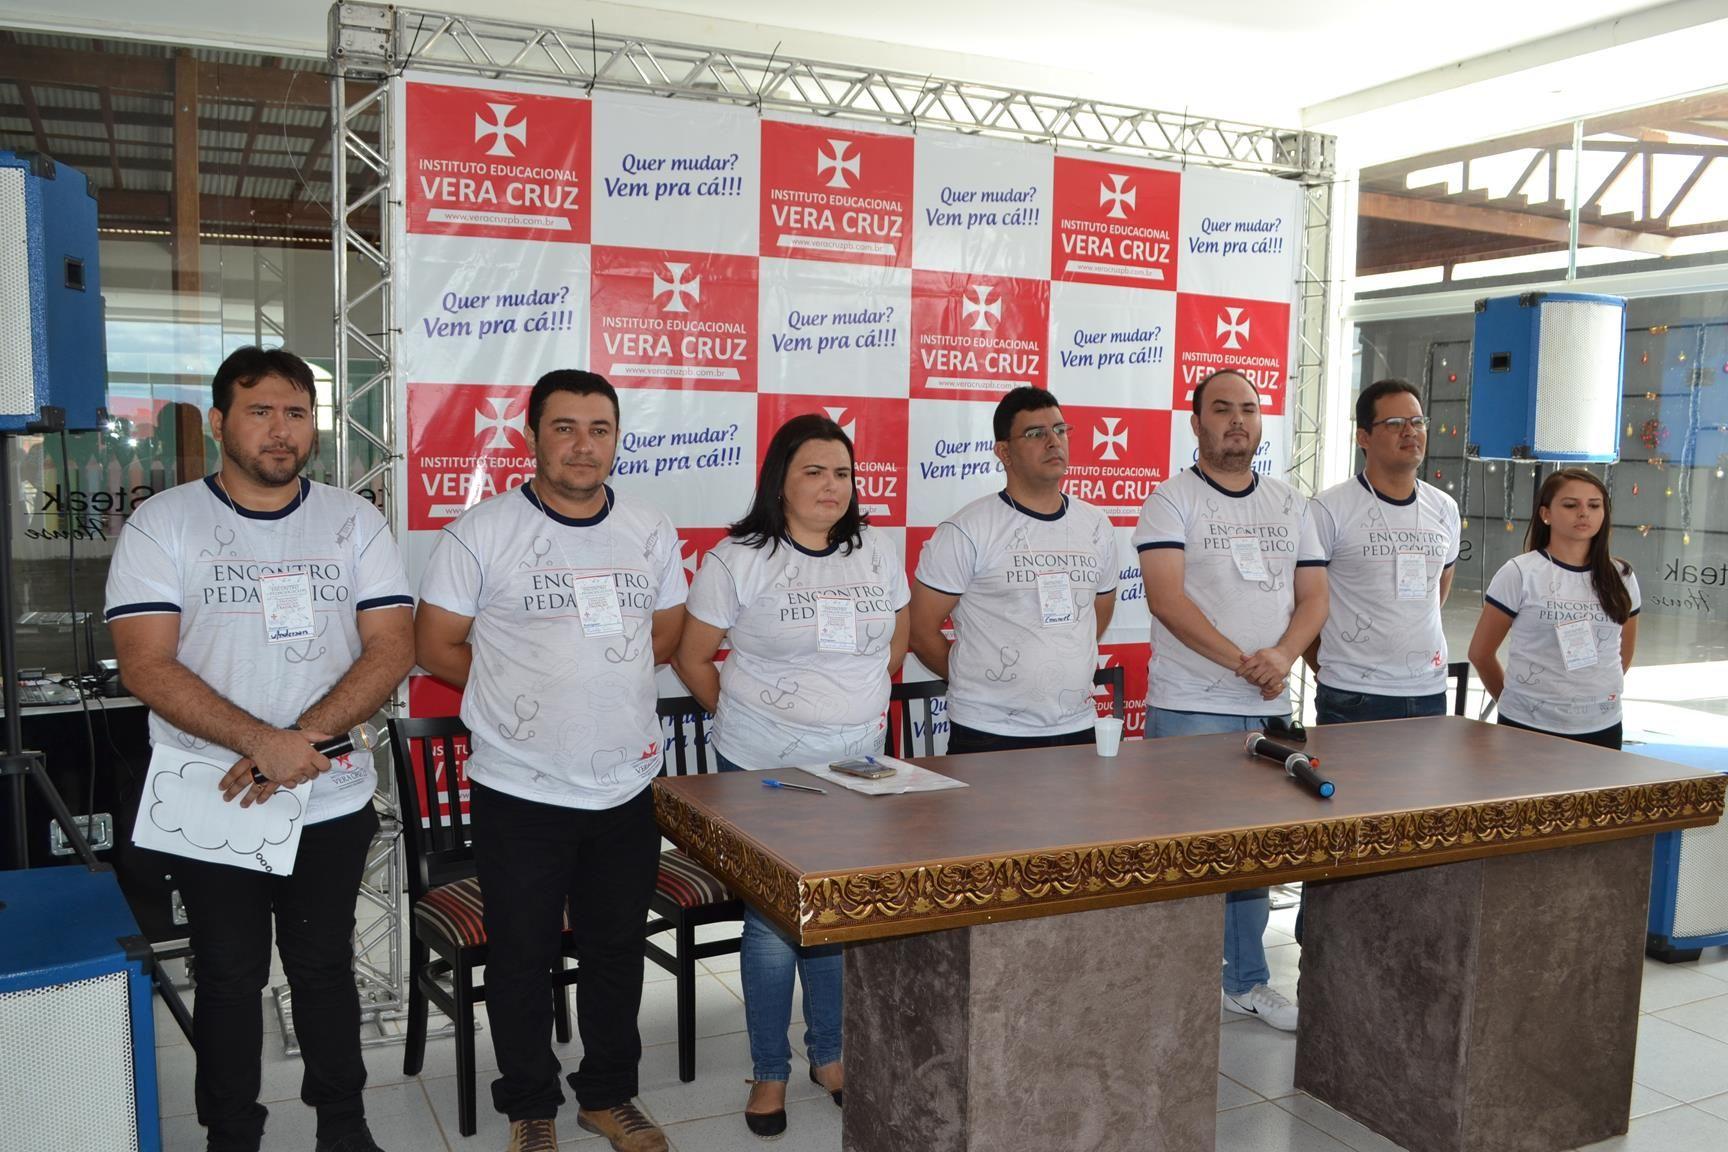 Vera Cruz realiza Encontro Pedagógico para 2018